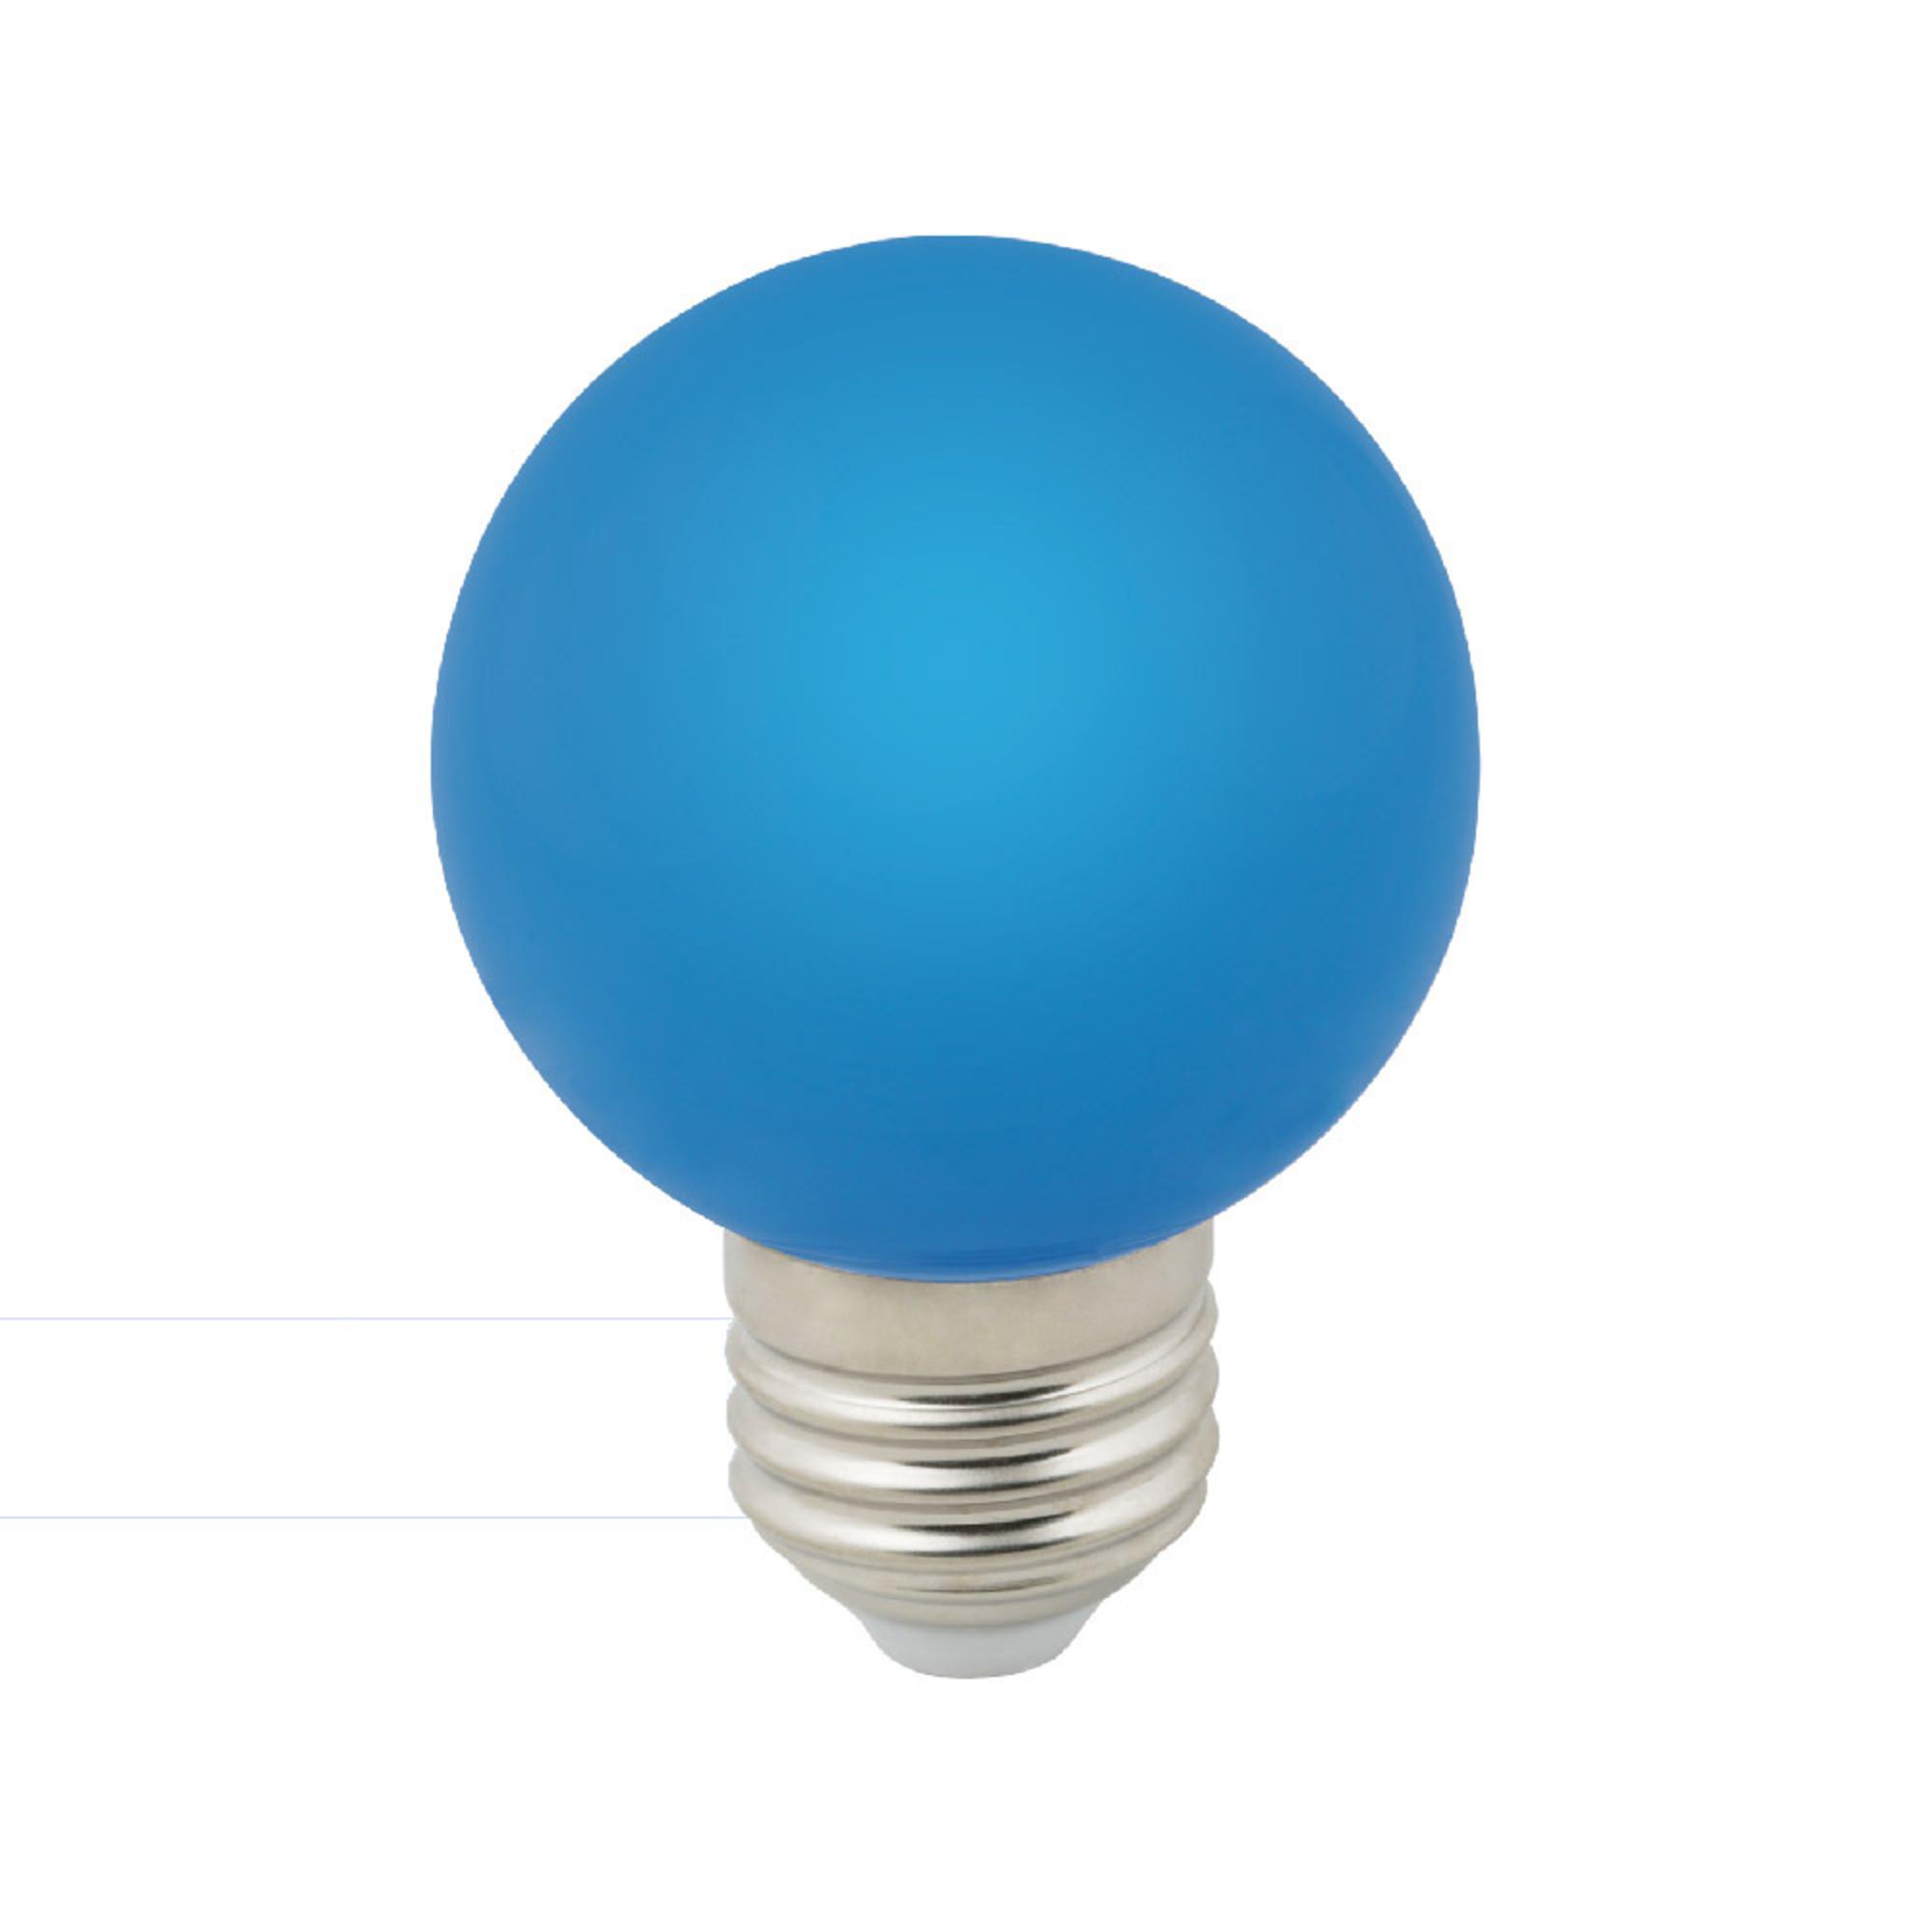 Лампа светодиодная E27 3 Вт шар синий 240 лм синий свет